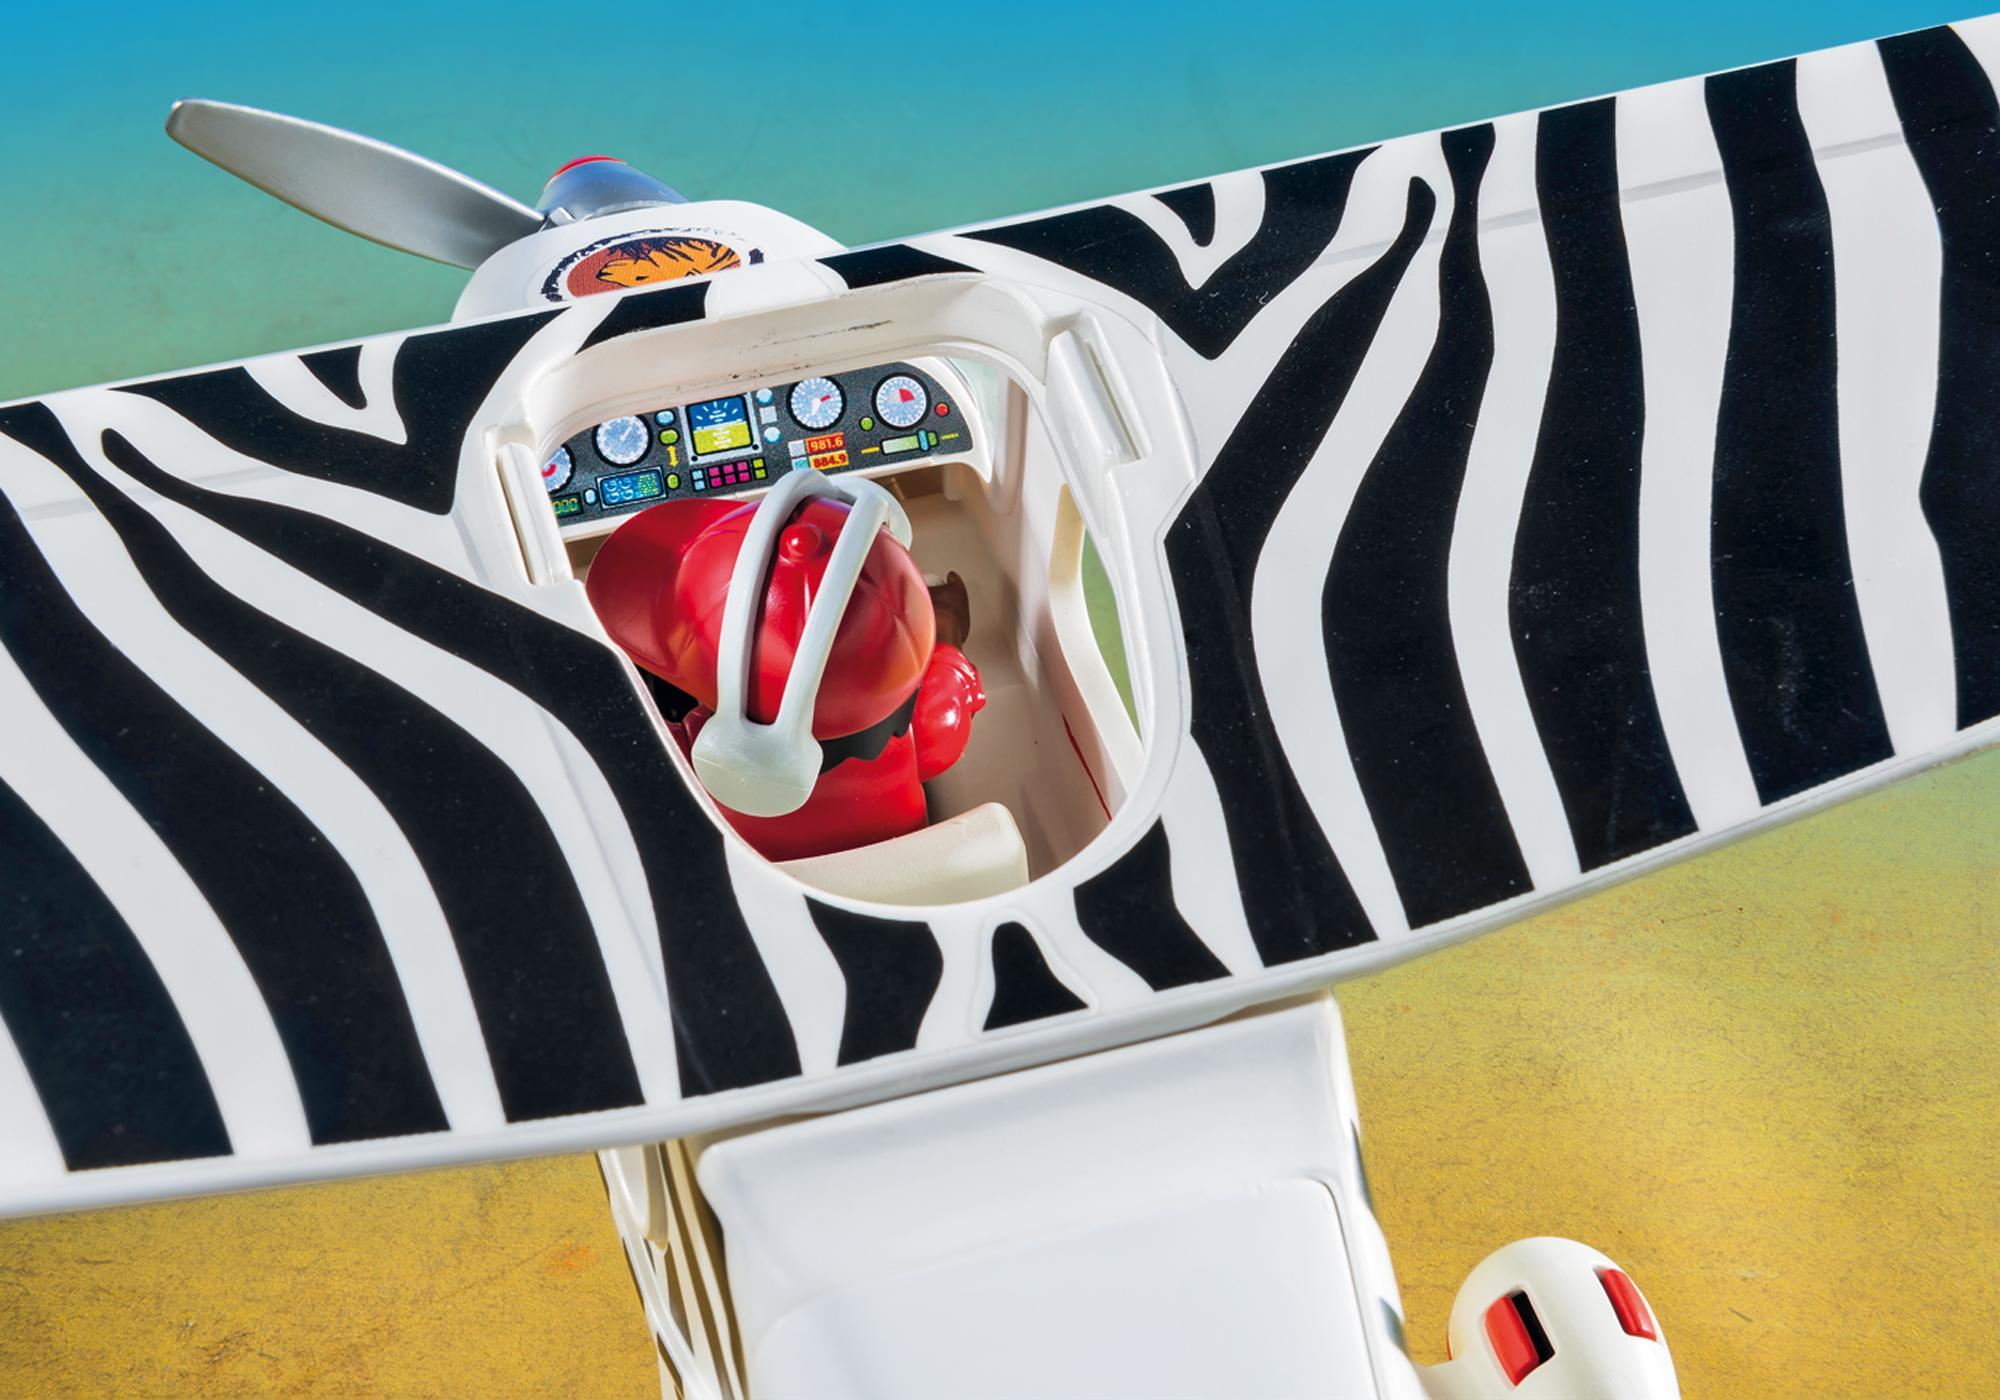 http://media.playmobil.com/i/playmobil/6938_product_extra3/Avion avec explorateurs